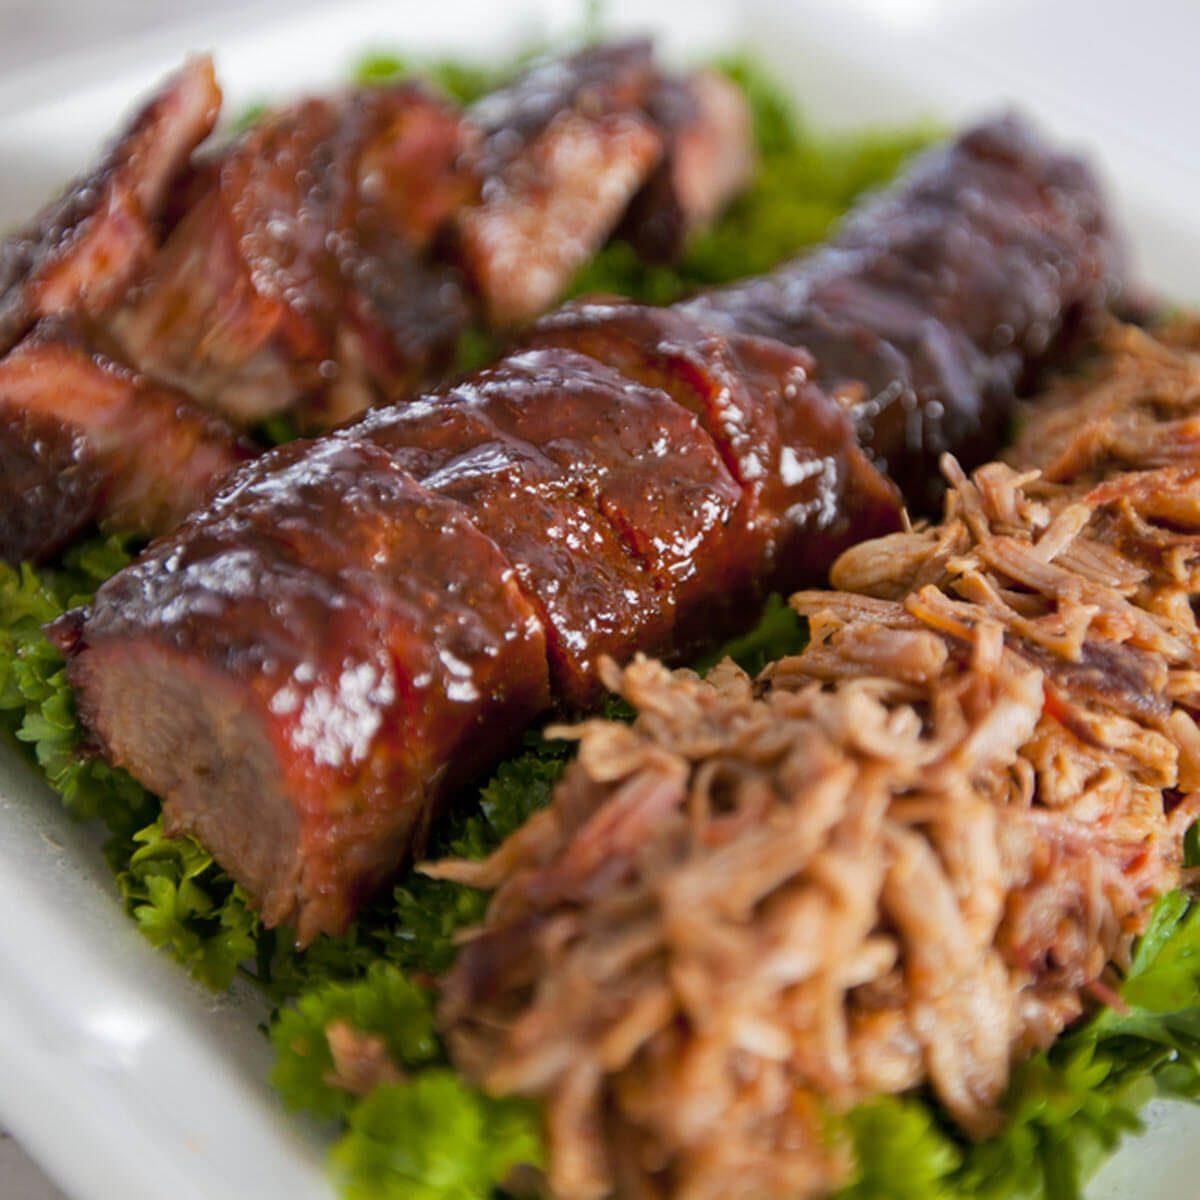 shutterstock_153645155 smoked meat